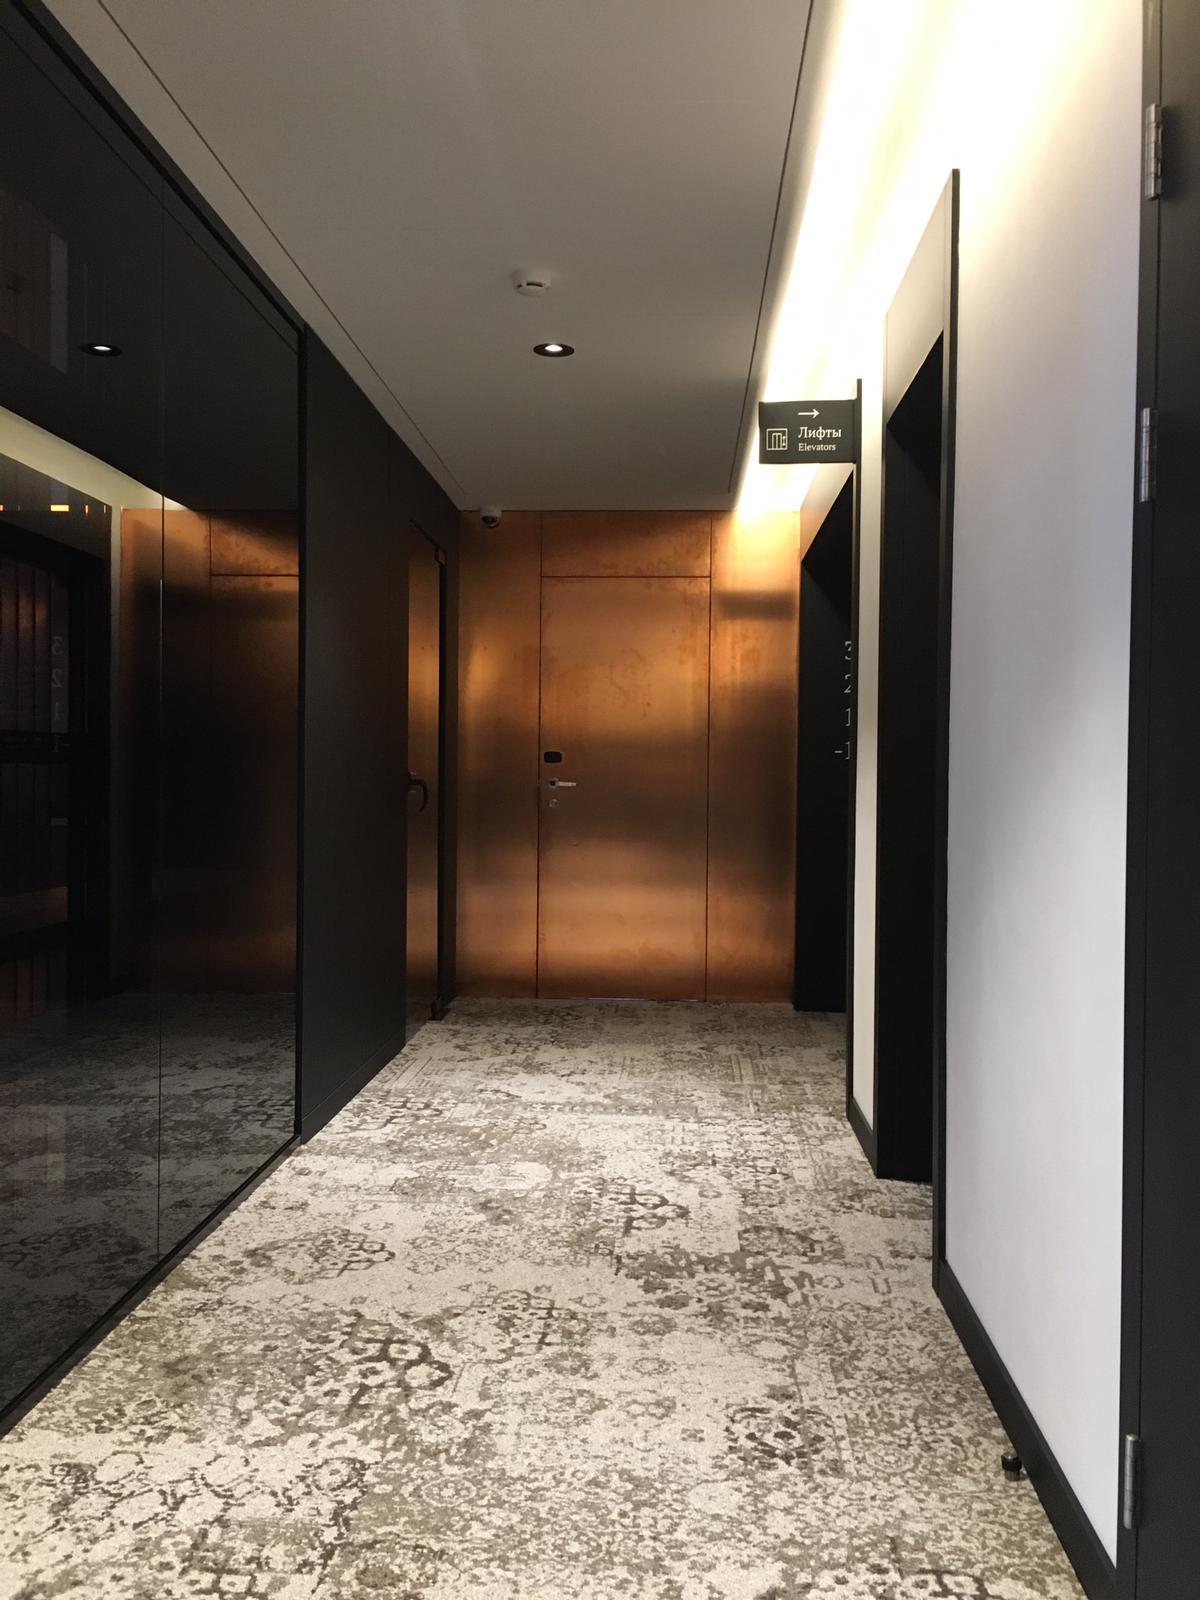 G:\Mans disks\Projekti\Fotogrāfijas\Balsan\Hotel Dvor Podznoeva\French Couture Collection - Cesar\c0c5d867-a516-4987-917b-19f5dcfcae97.jpg